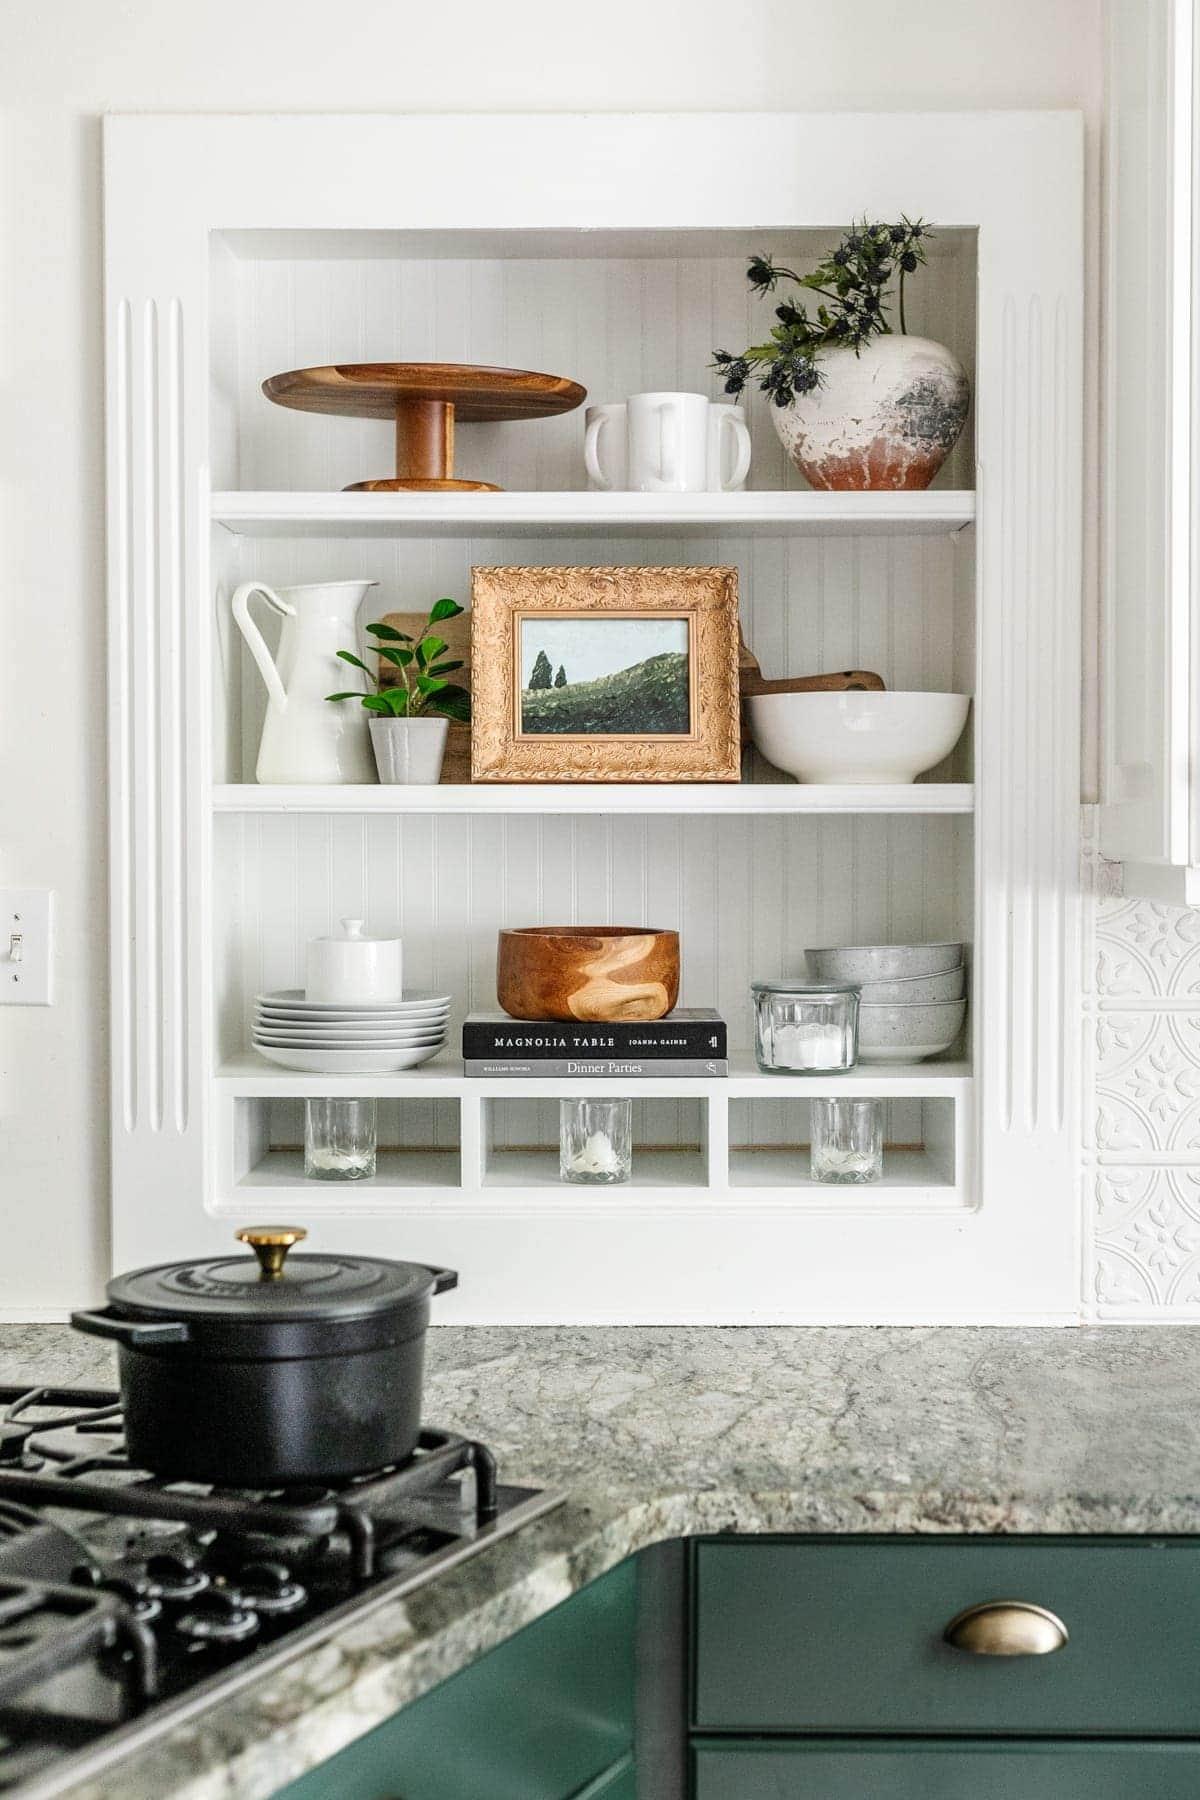 kitchen shelf decor with DIY art painting